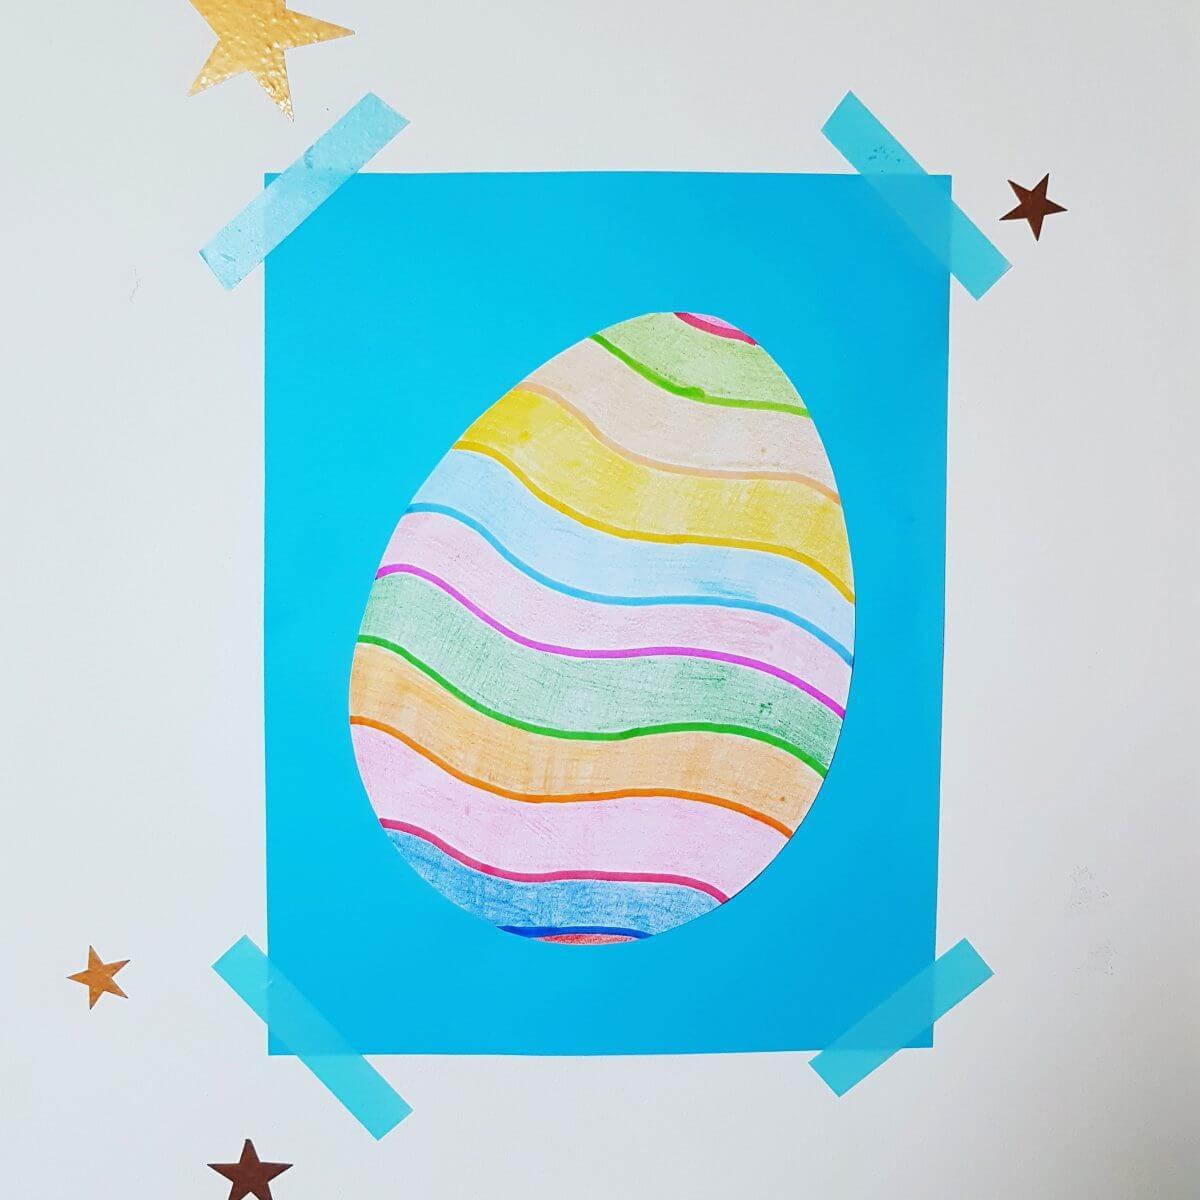 Knutselen voor Pasen: de leukste ideeën. Paasei knutsels. Easter egg crafting